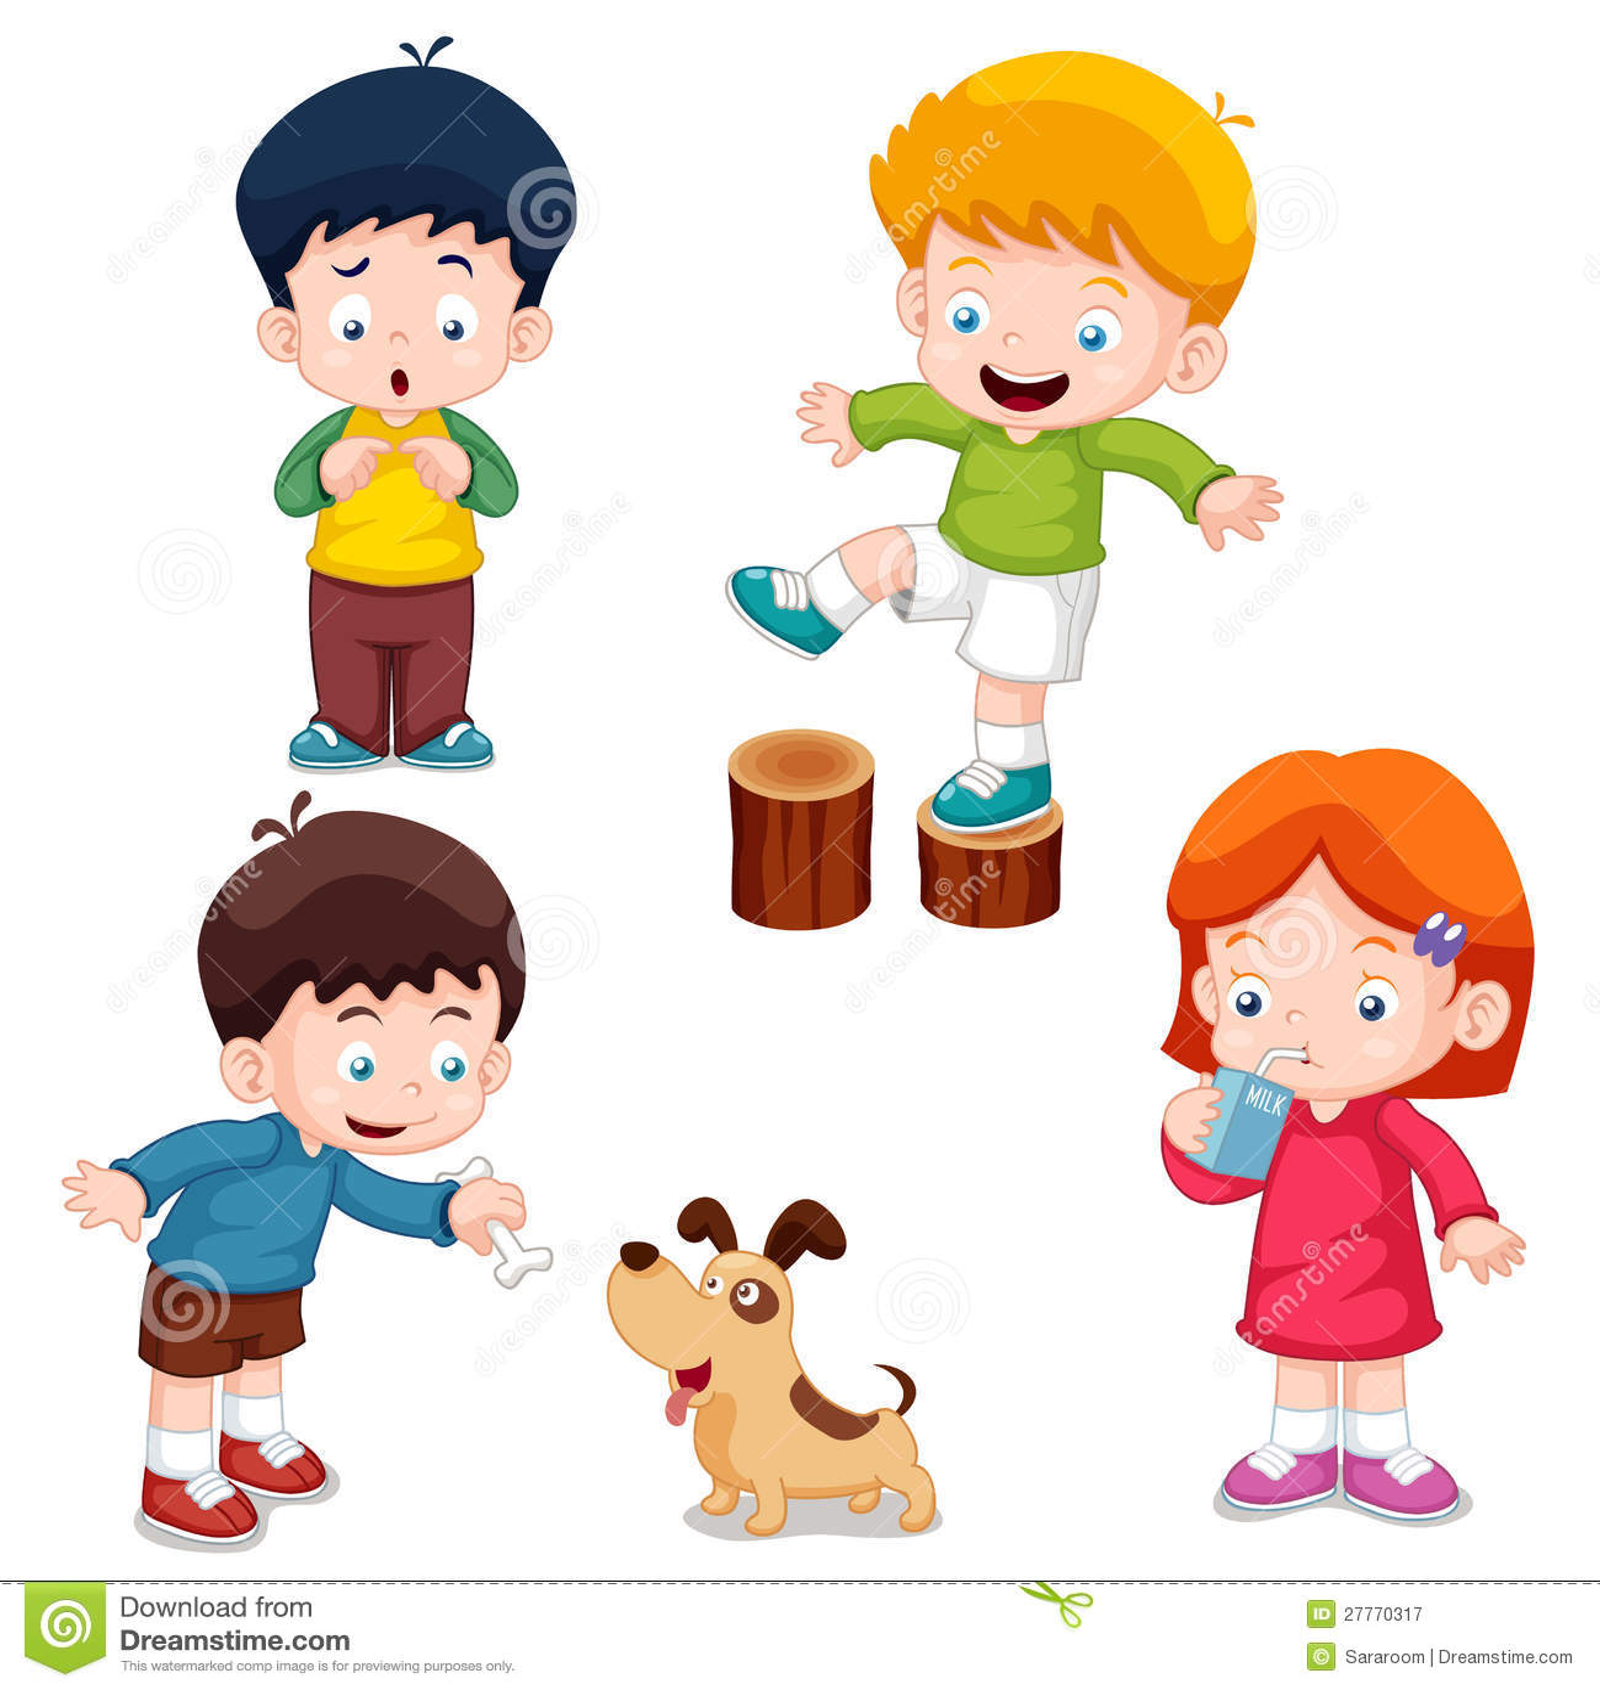 free kid downloads akba greenw co